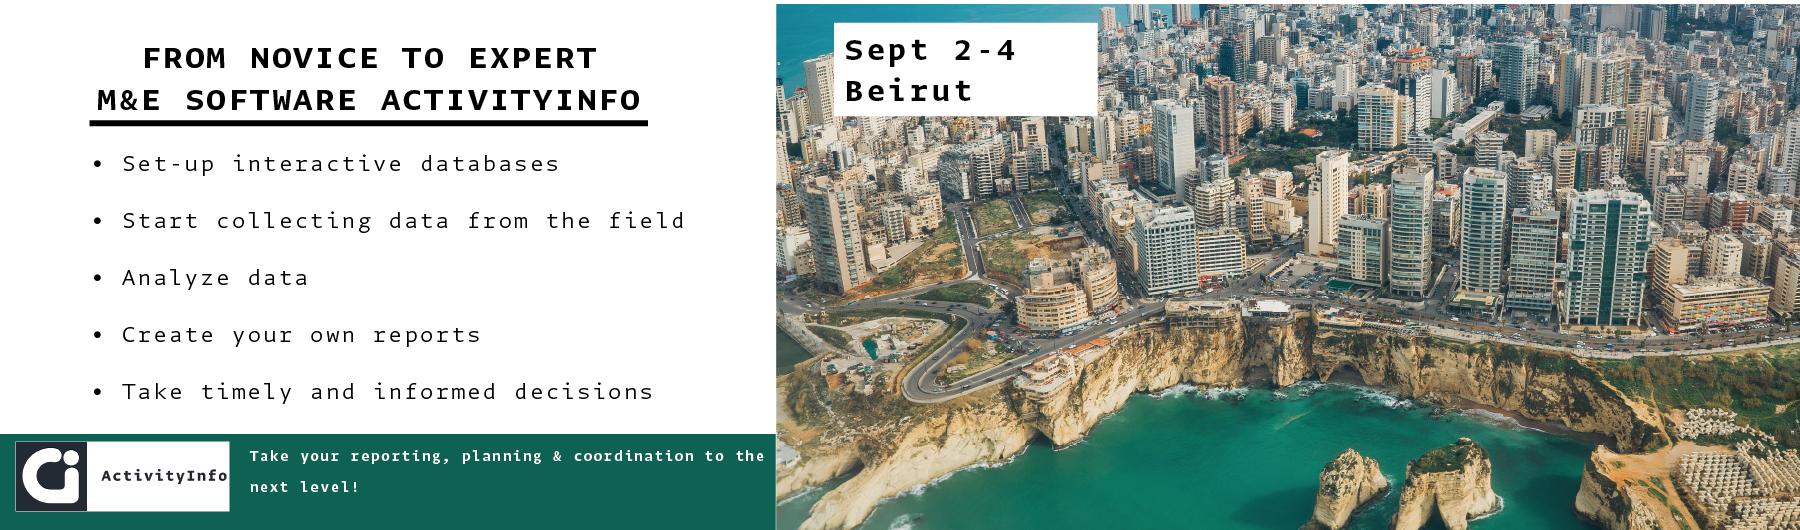 2nd-3rd-4th September 2019 - Beirut Training